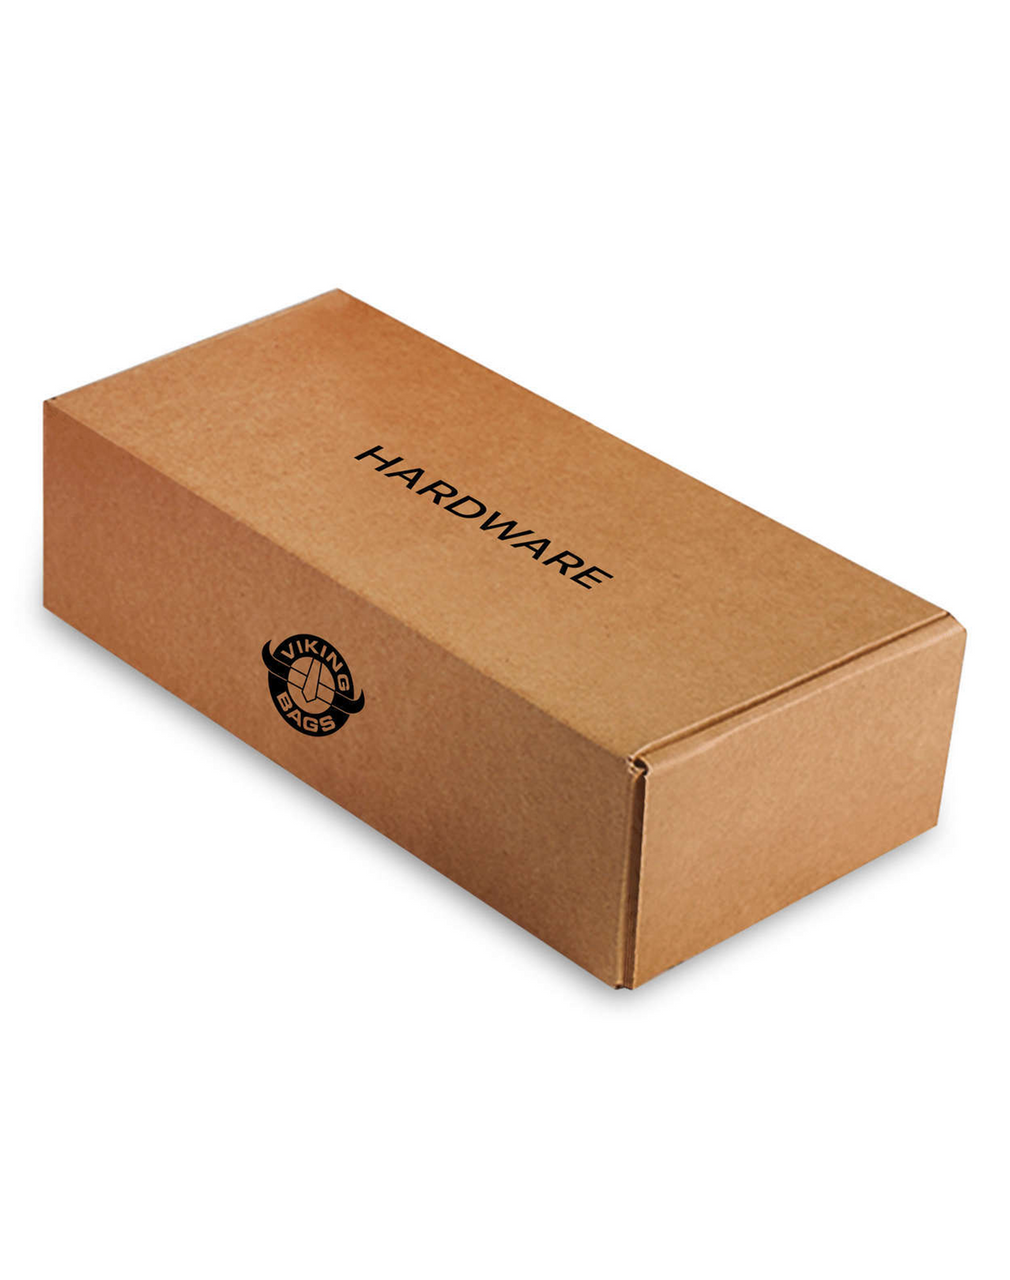 Honda VTX 1800 N Warrior Shock Cutout Slanted Motorcycle Saddlebags Box